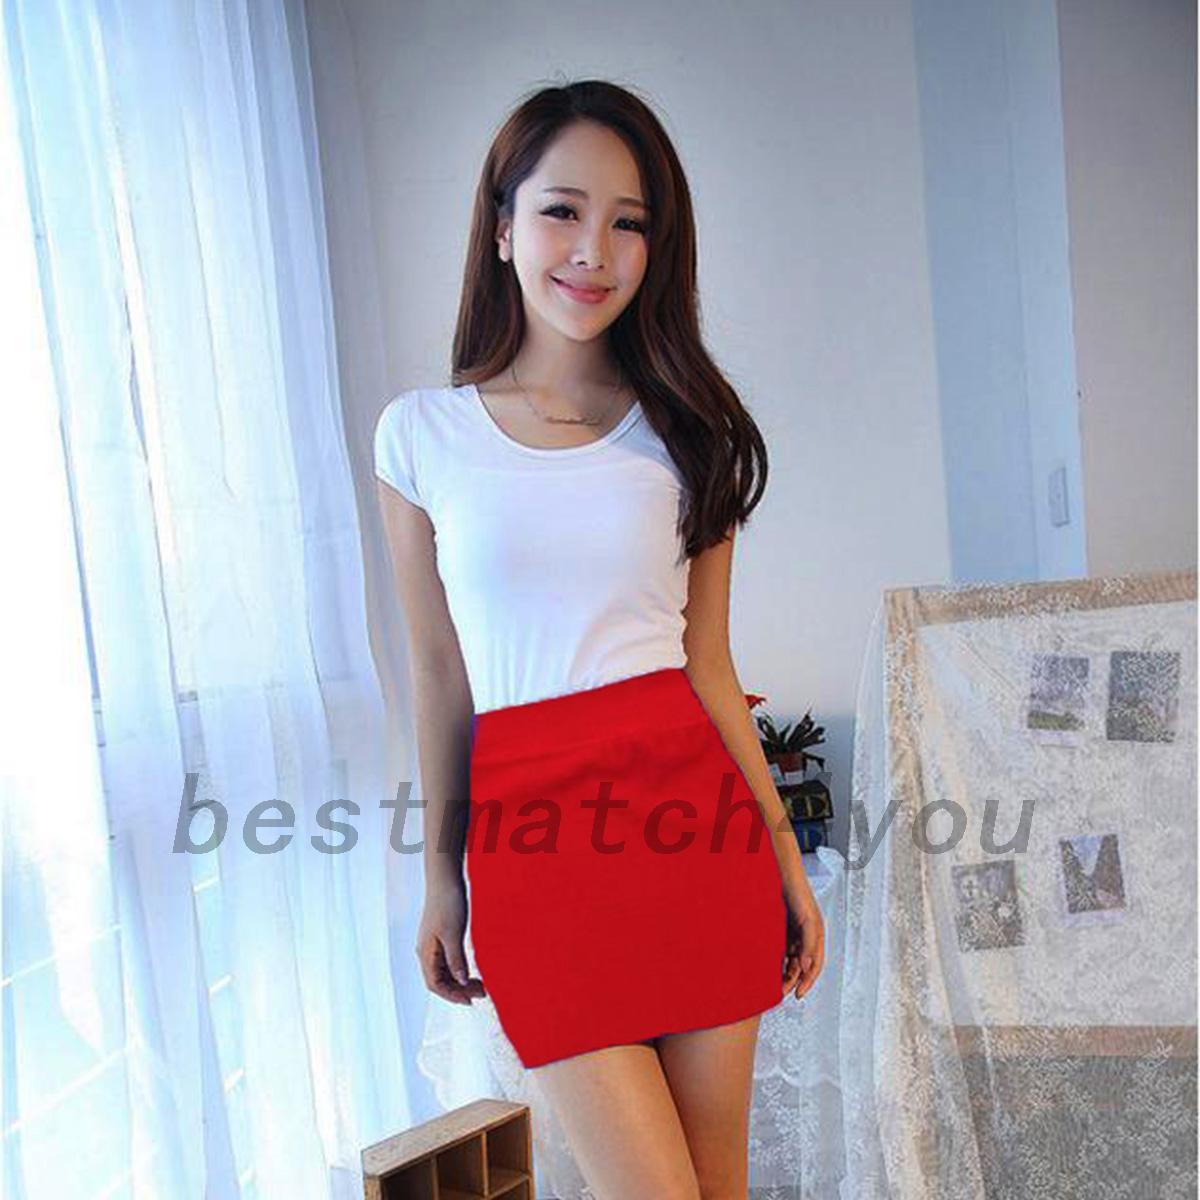 femmes sexy jupe crayon taille haute mini robe moulante extensible jupe bureau. Black Bedroom Furniture Sets. Home Design Ideas